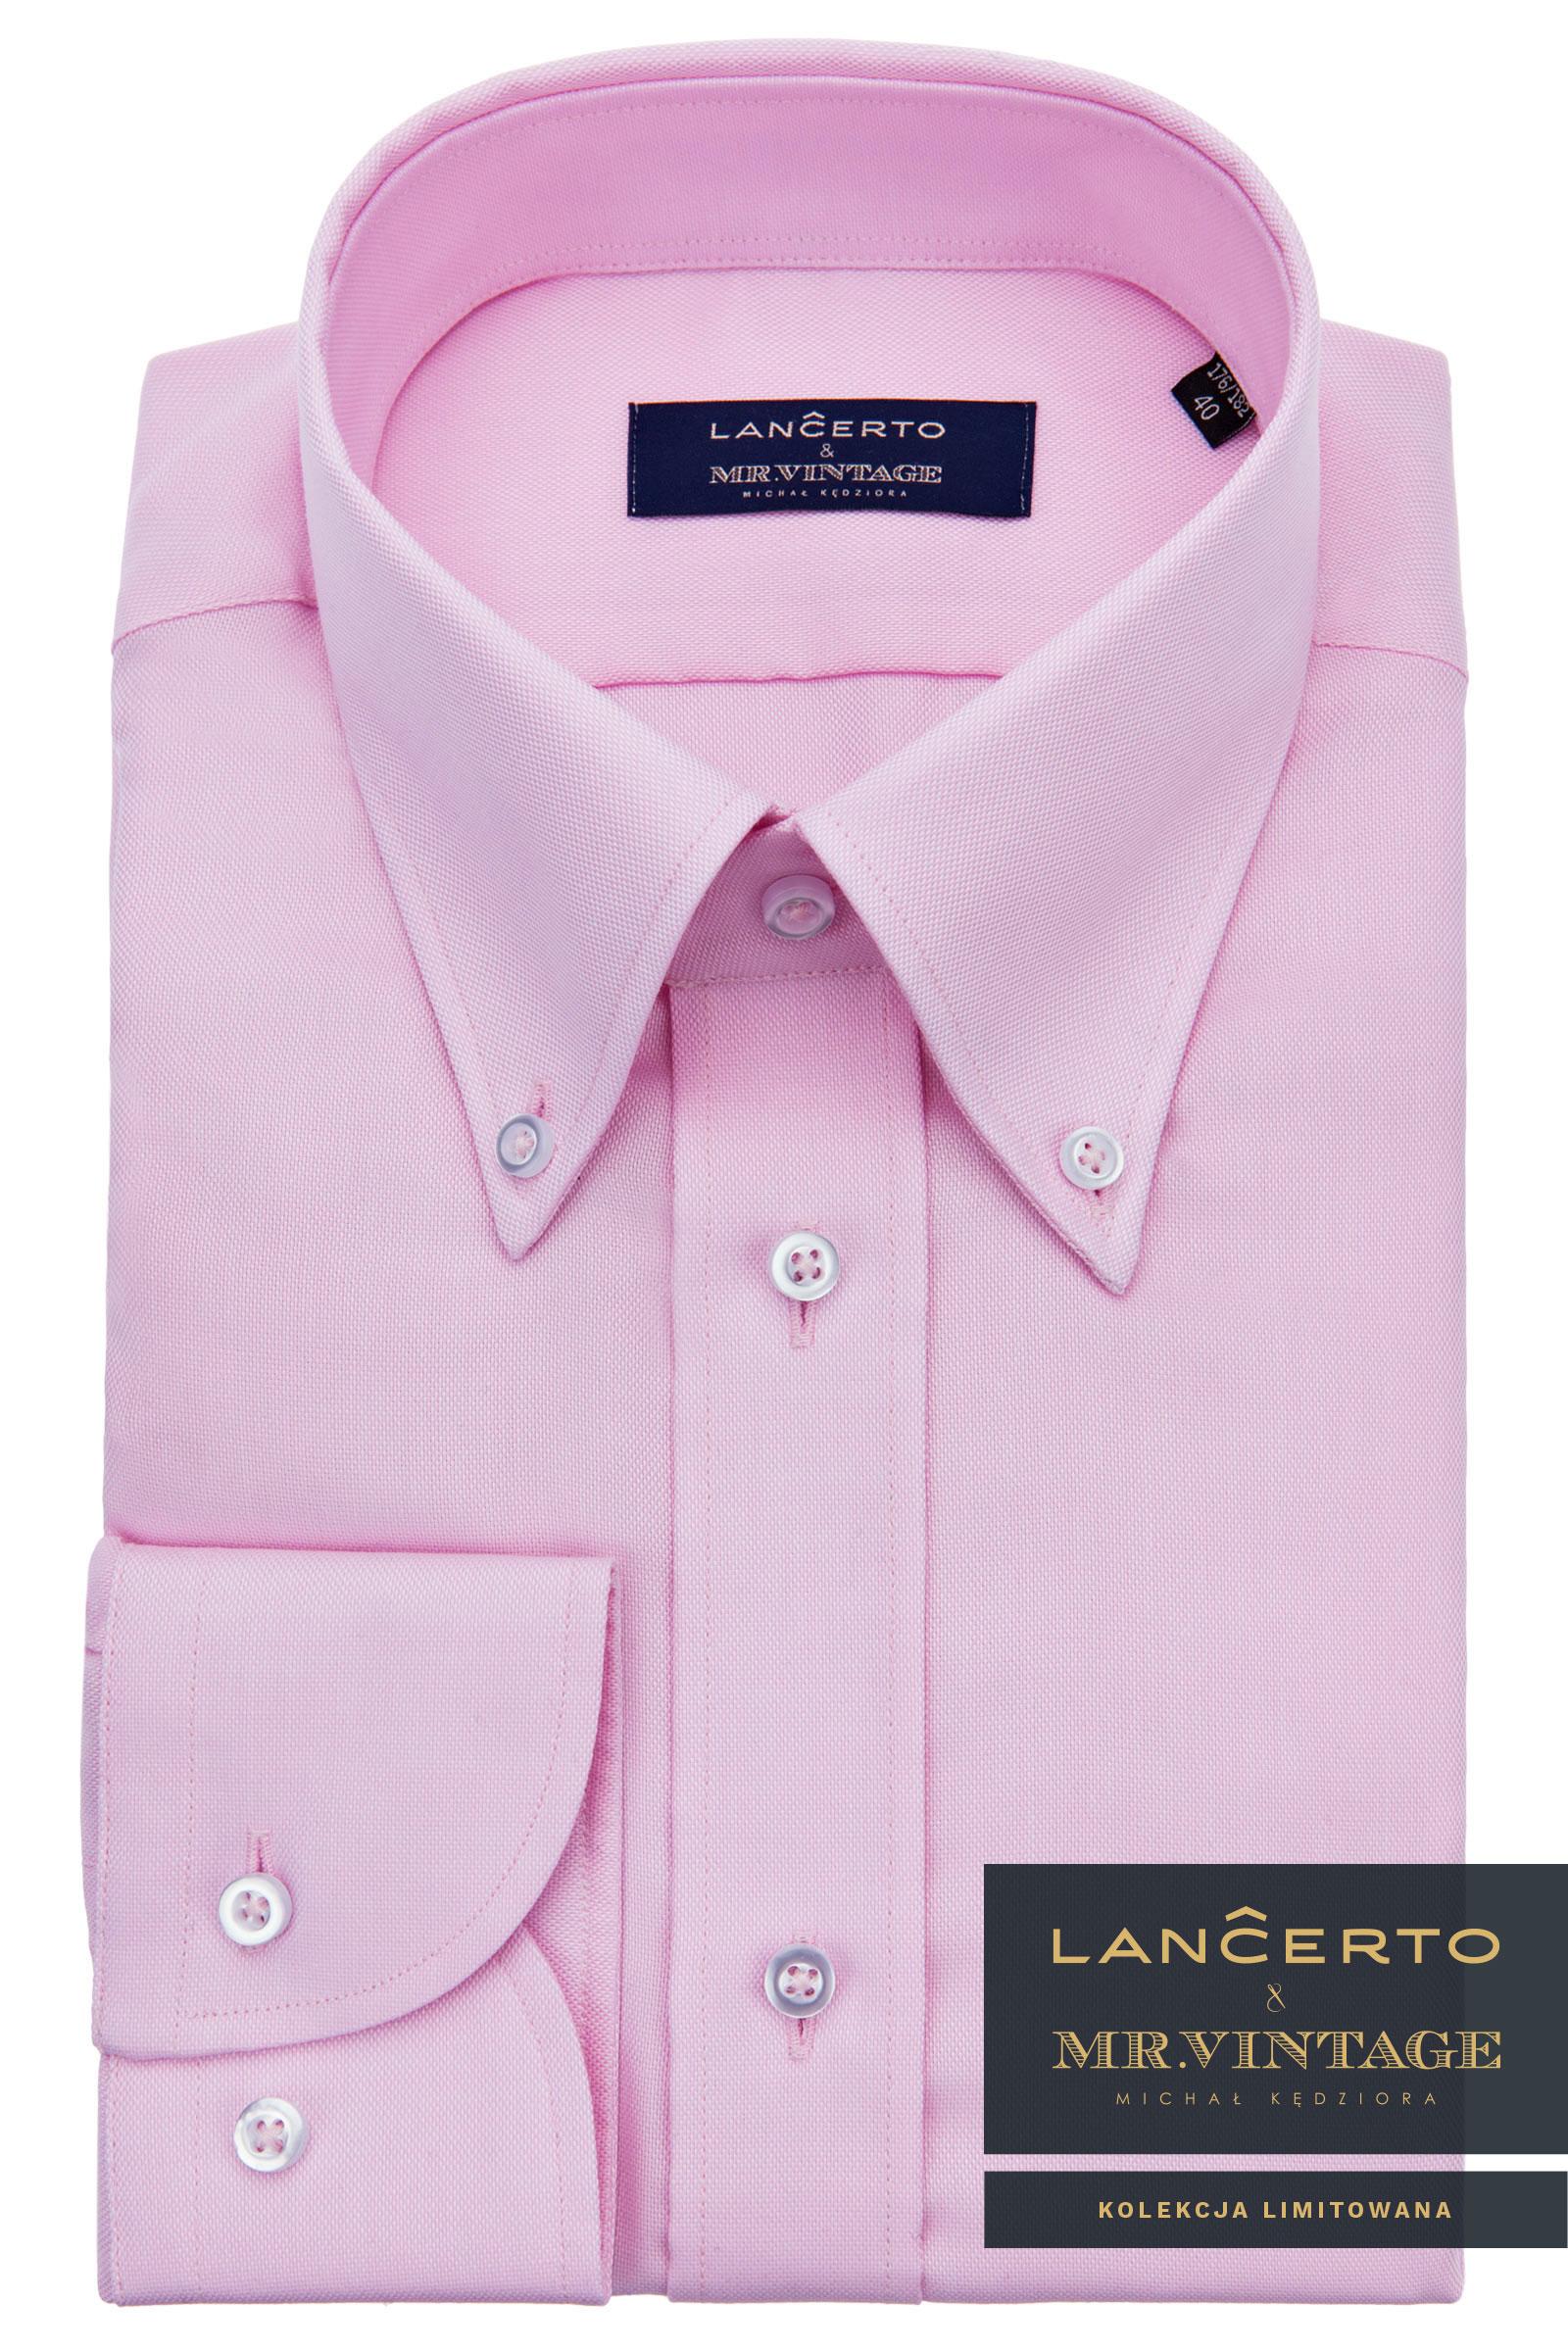 Lancerto tričko&Pán Vintage Most 176/43